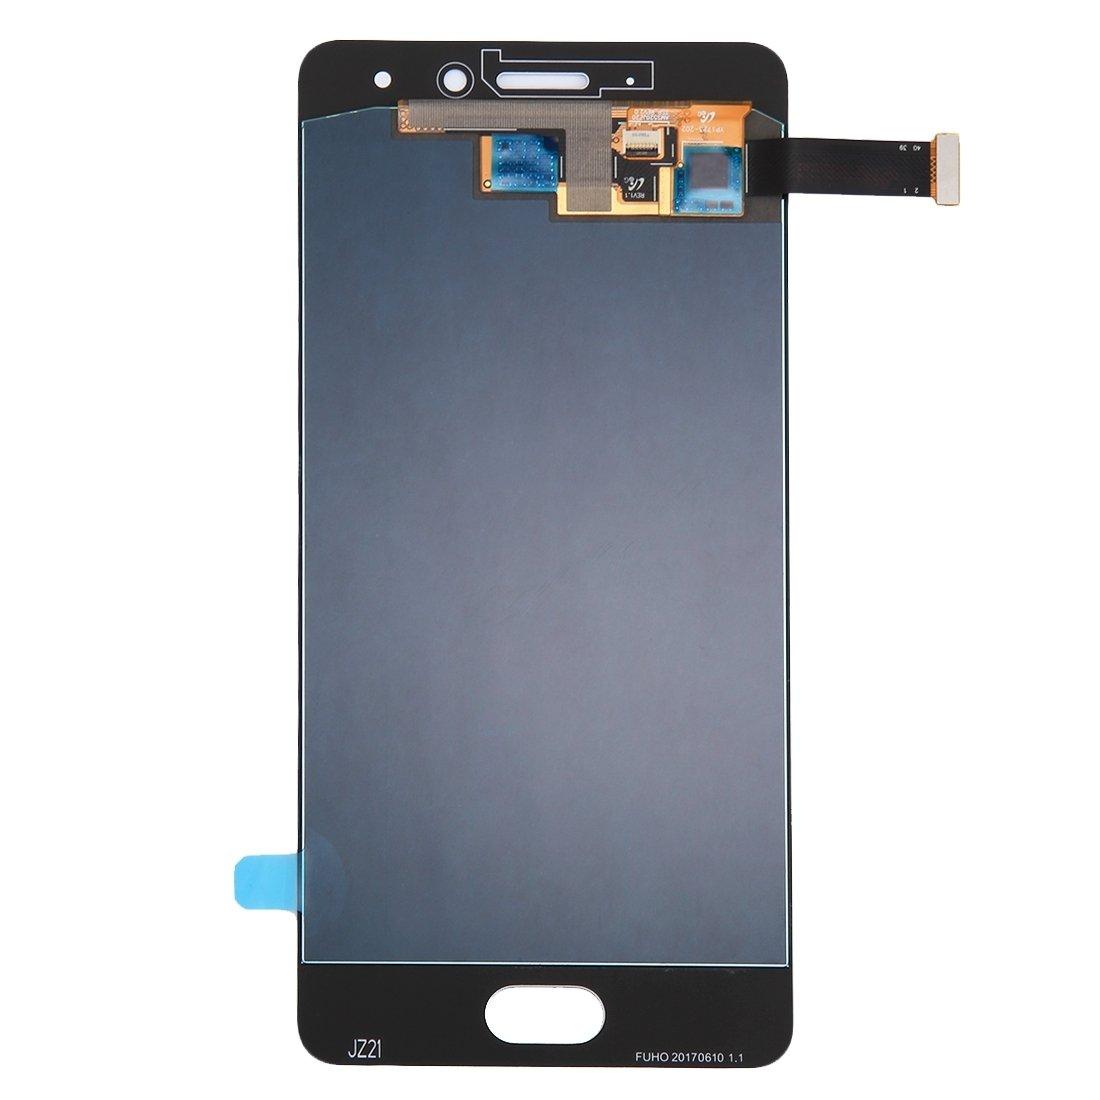 7205467f4ee Cellphone Replacement Parts Repuestos para celulares iPartsBuy Meizu Pro 7  Pantalla LCD + Pantalla táctil Repuestos para celulares: Amazon.es:  Electrónica